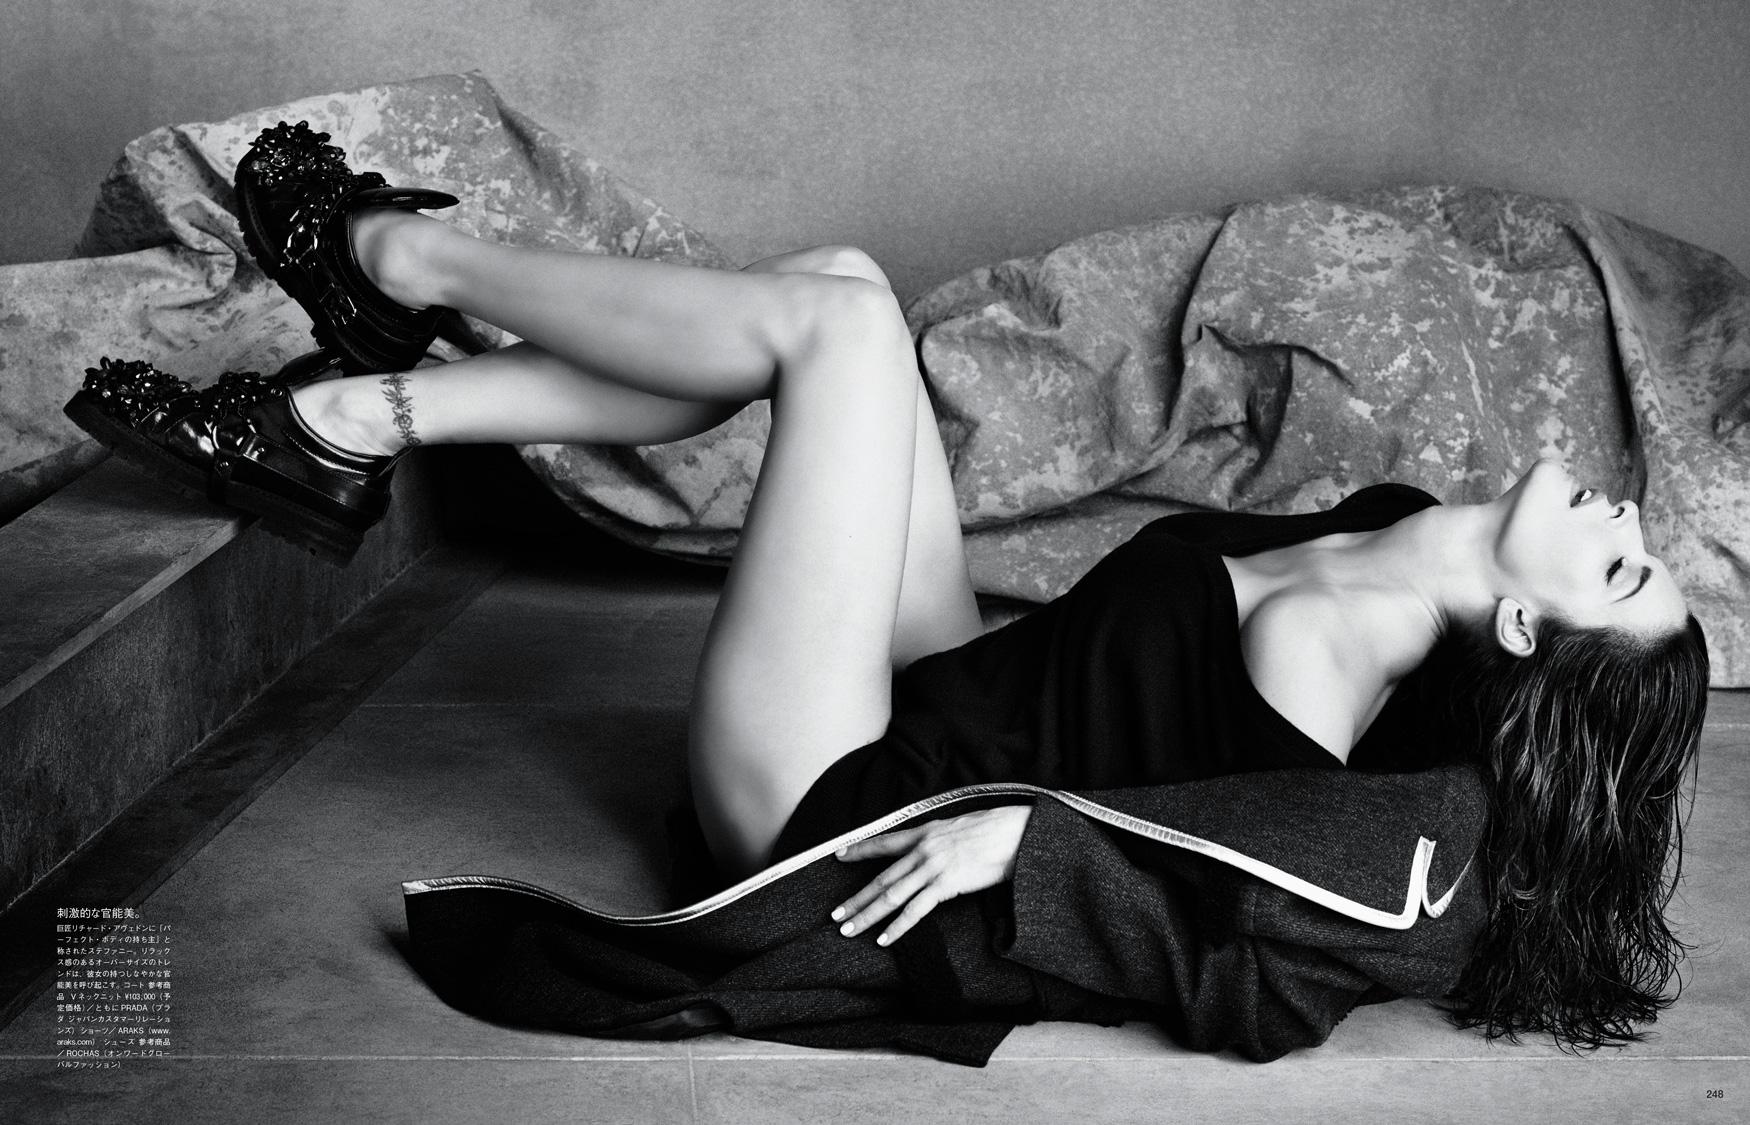 Giovanna-Battaglia-The-Icons-Of-Perfections-Vogue-Japan-15th-Anniversary-Issue-Luigi-Iango-V181_248_200-19.jpg